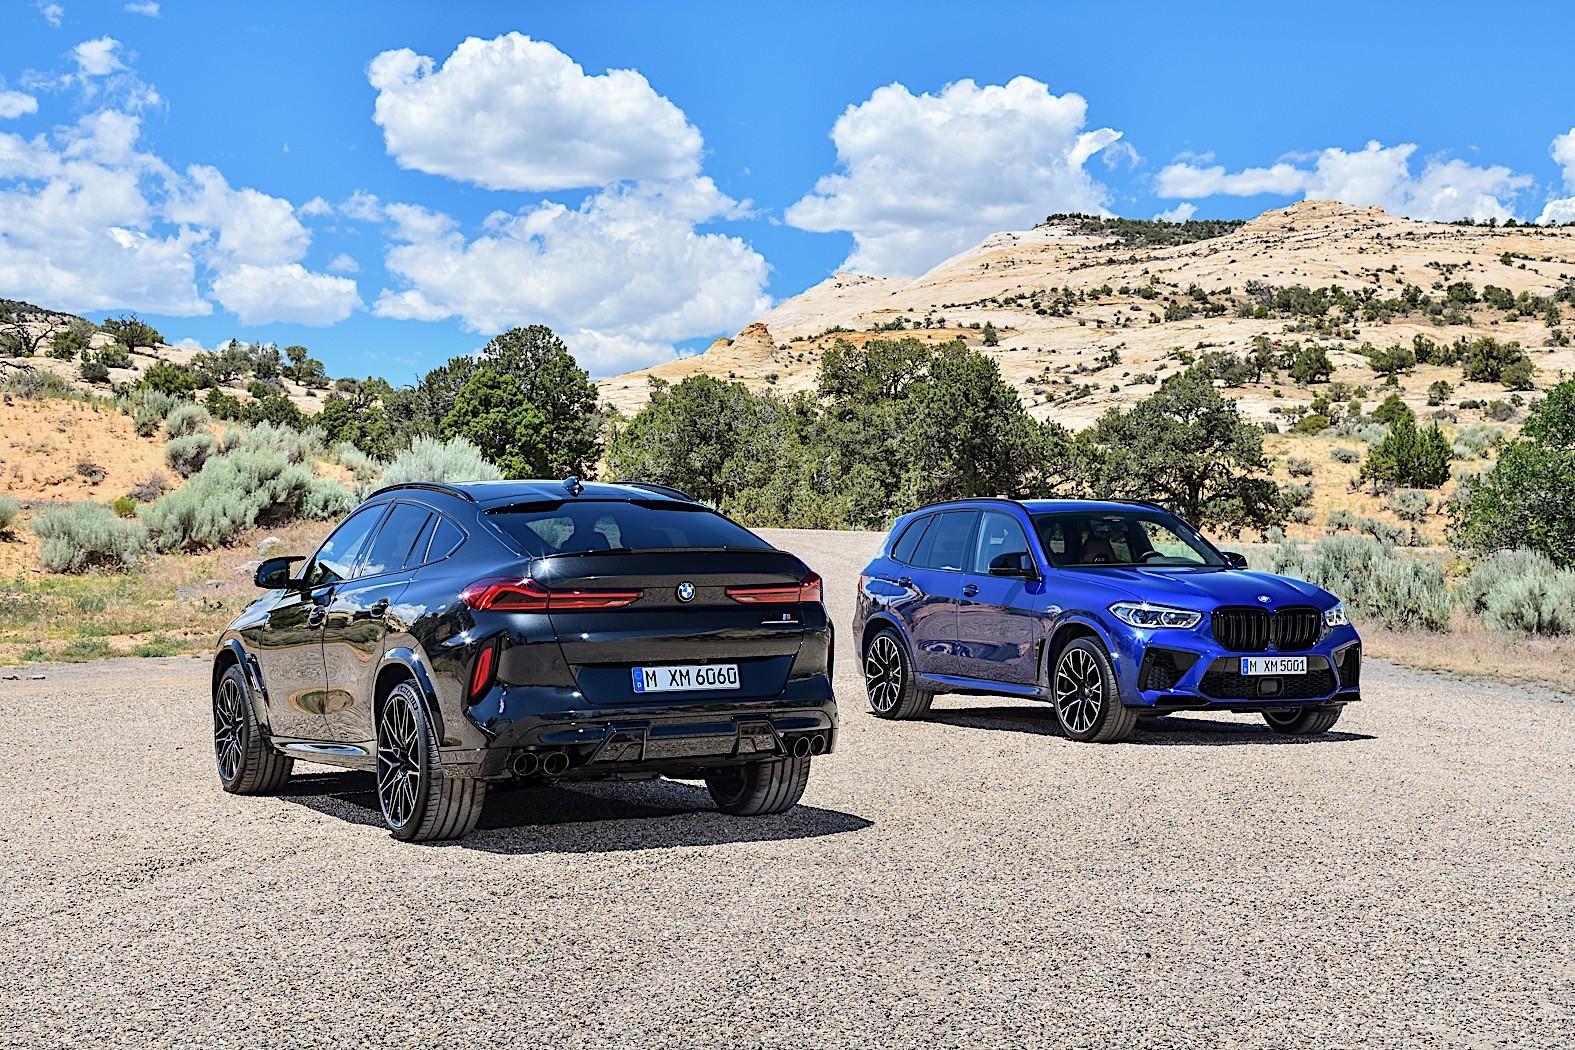 2020 Bmw X5 Review.2020 Bmw X5 M Review Autoevolution